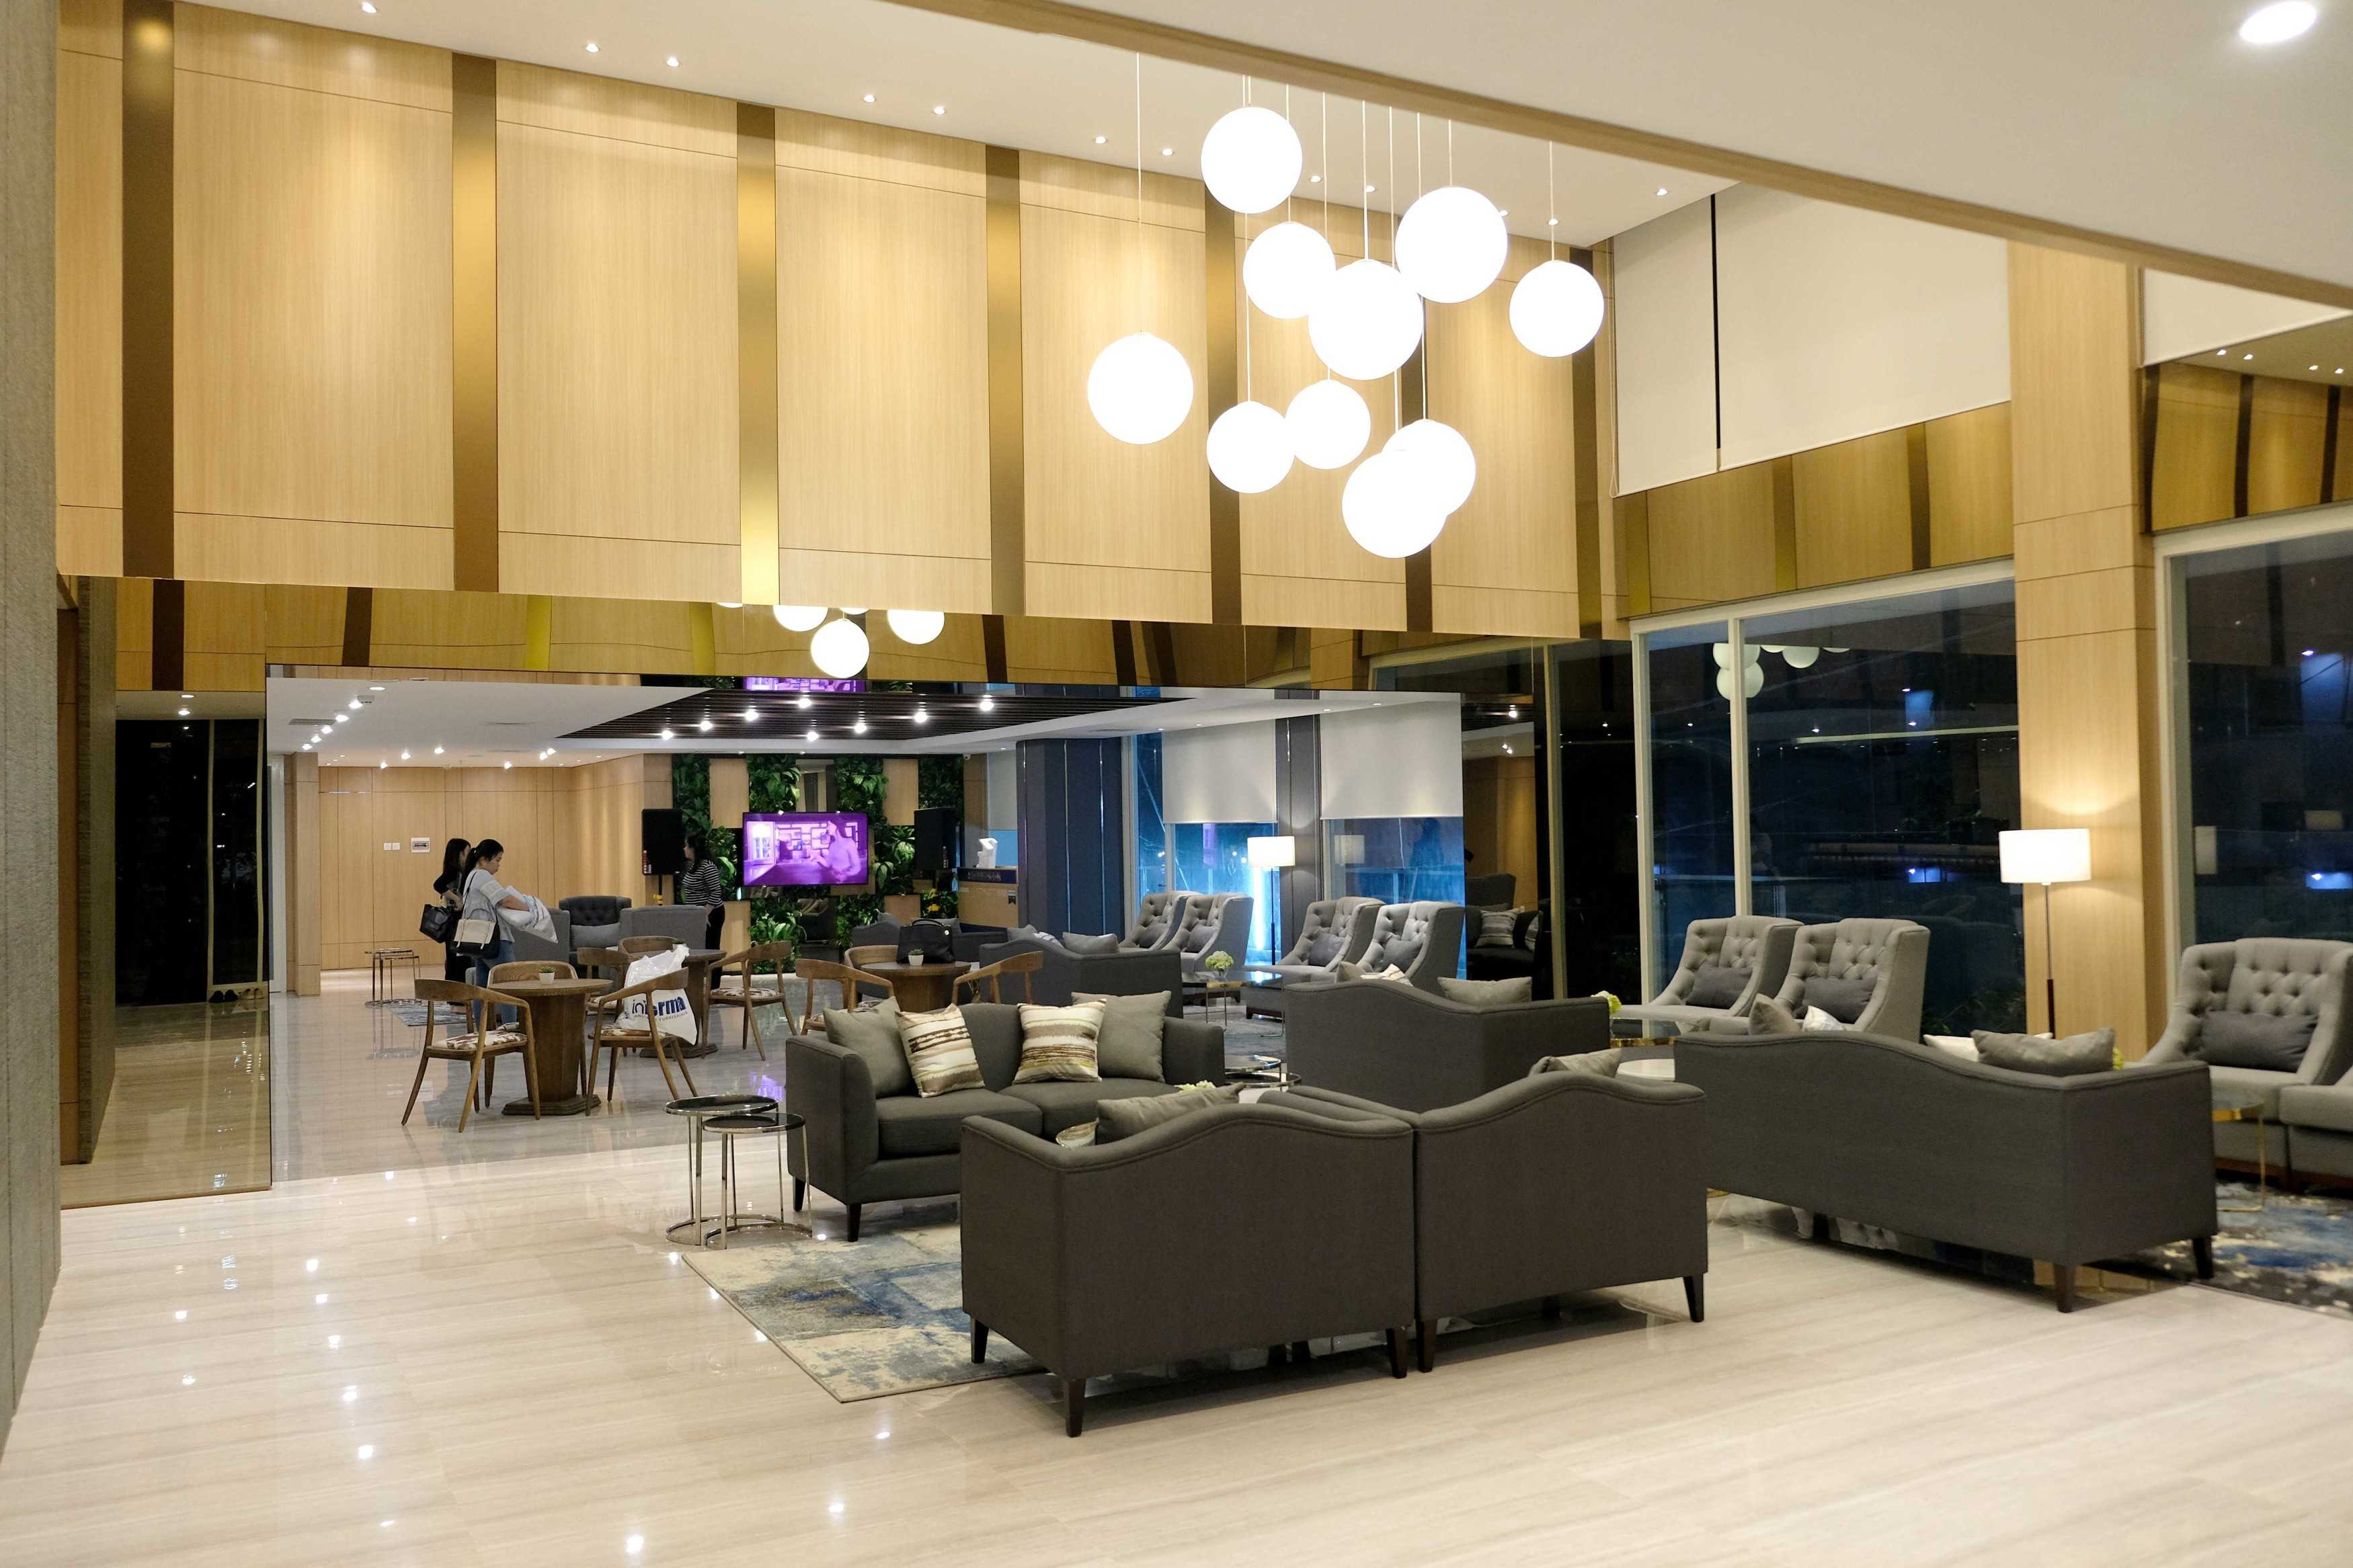 Equil Interior Hotel Dafam Pacific Caesar Surabaya, Kota Sby, Jawa Timur, Indonesia Surabaya, Kota Sby, Jawa Timur, Indonesia Equil-Interior-Hotel-Dafam-Pacific-Caesar   53776